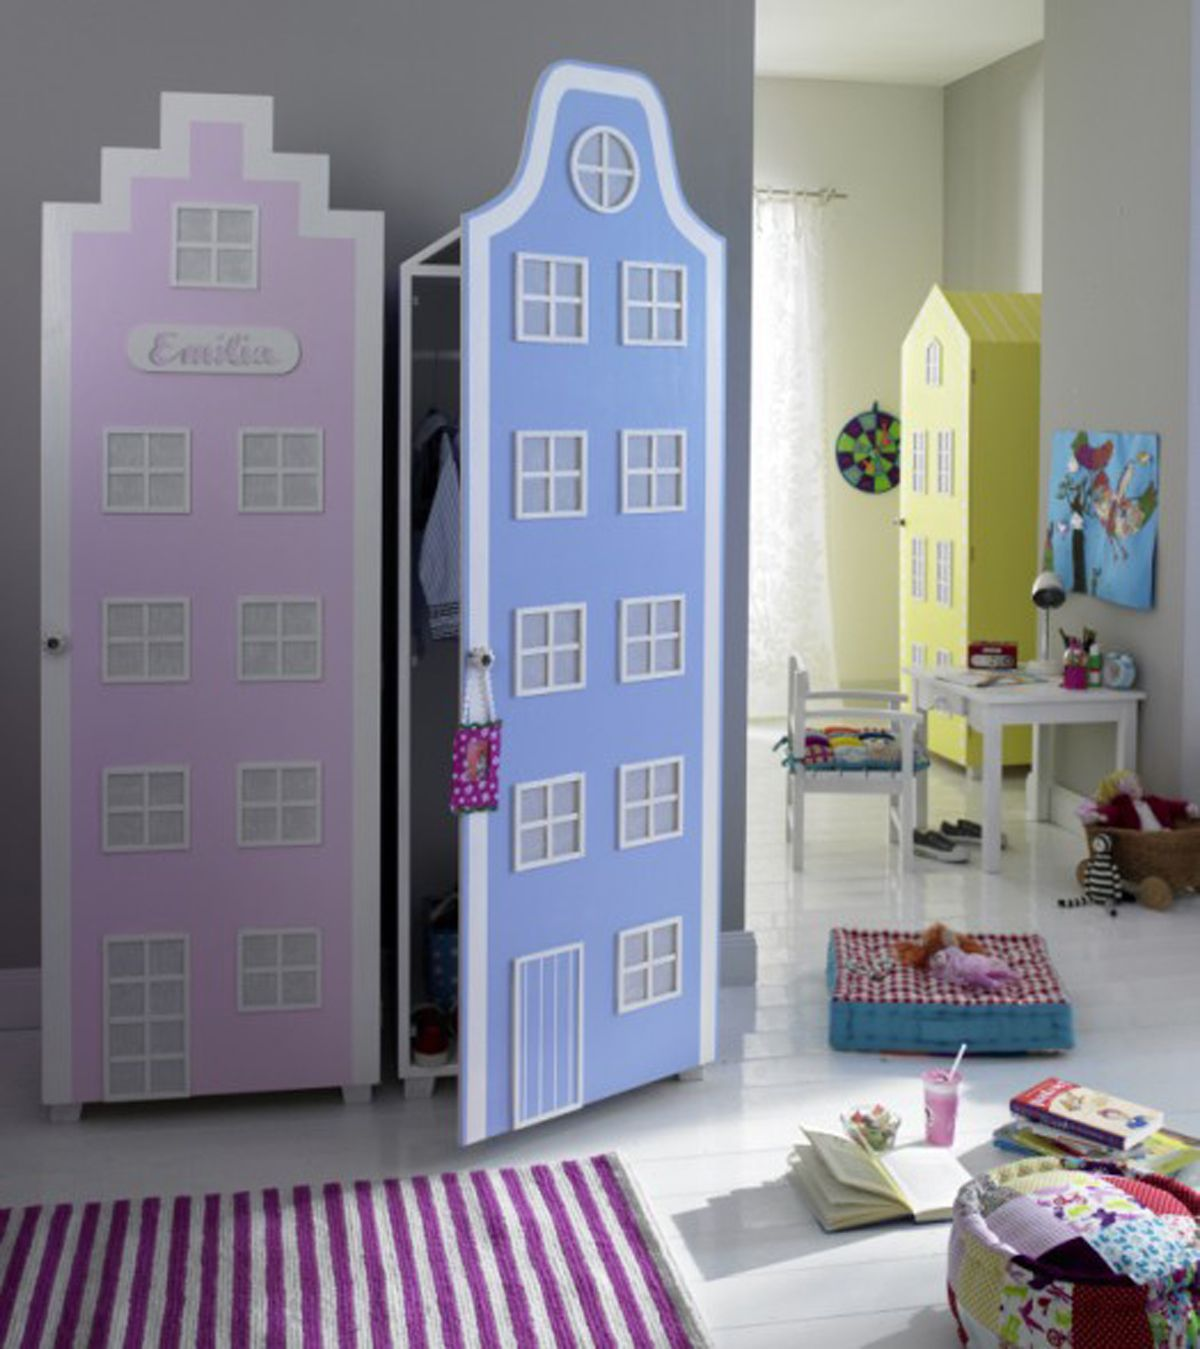 Kids Bedroom Wardrobe Designs pindawn mccolgan on indoors. | pinterest | architecture